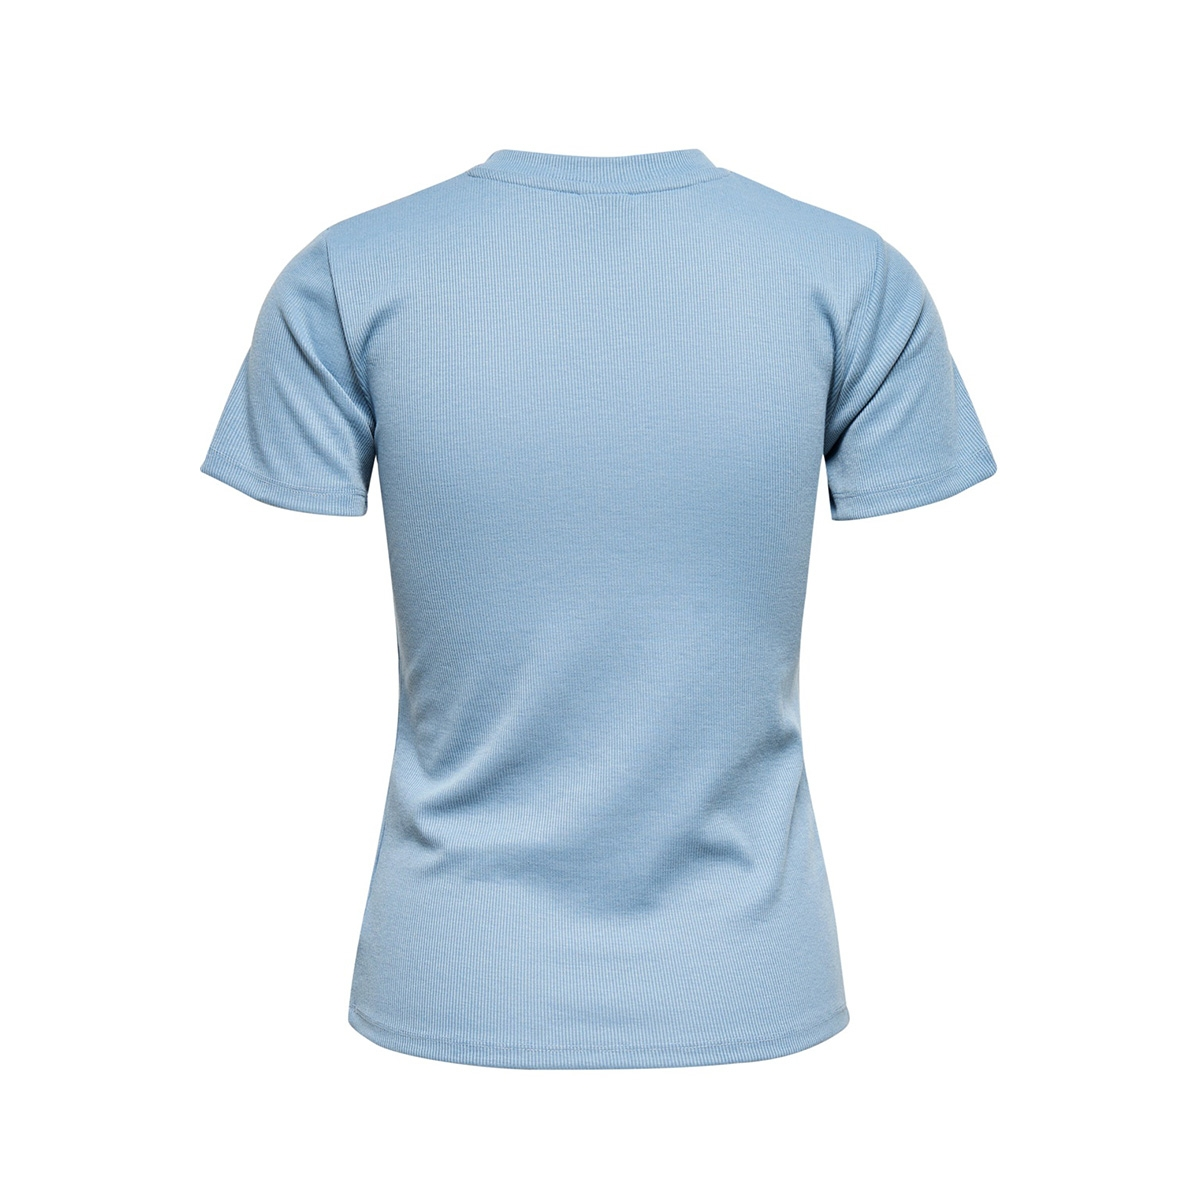 jdykissa s/s top jrs 15200591 jacqueline de yong t-shirt faded denim